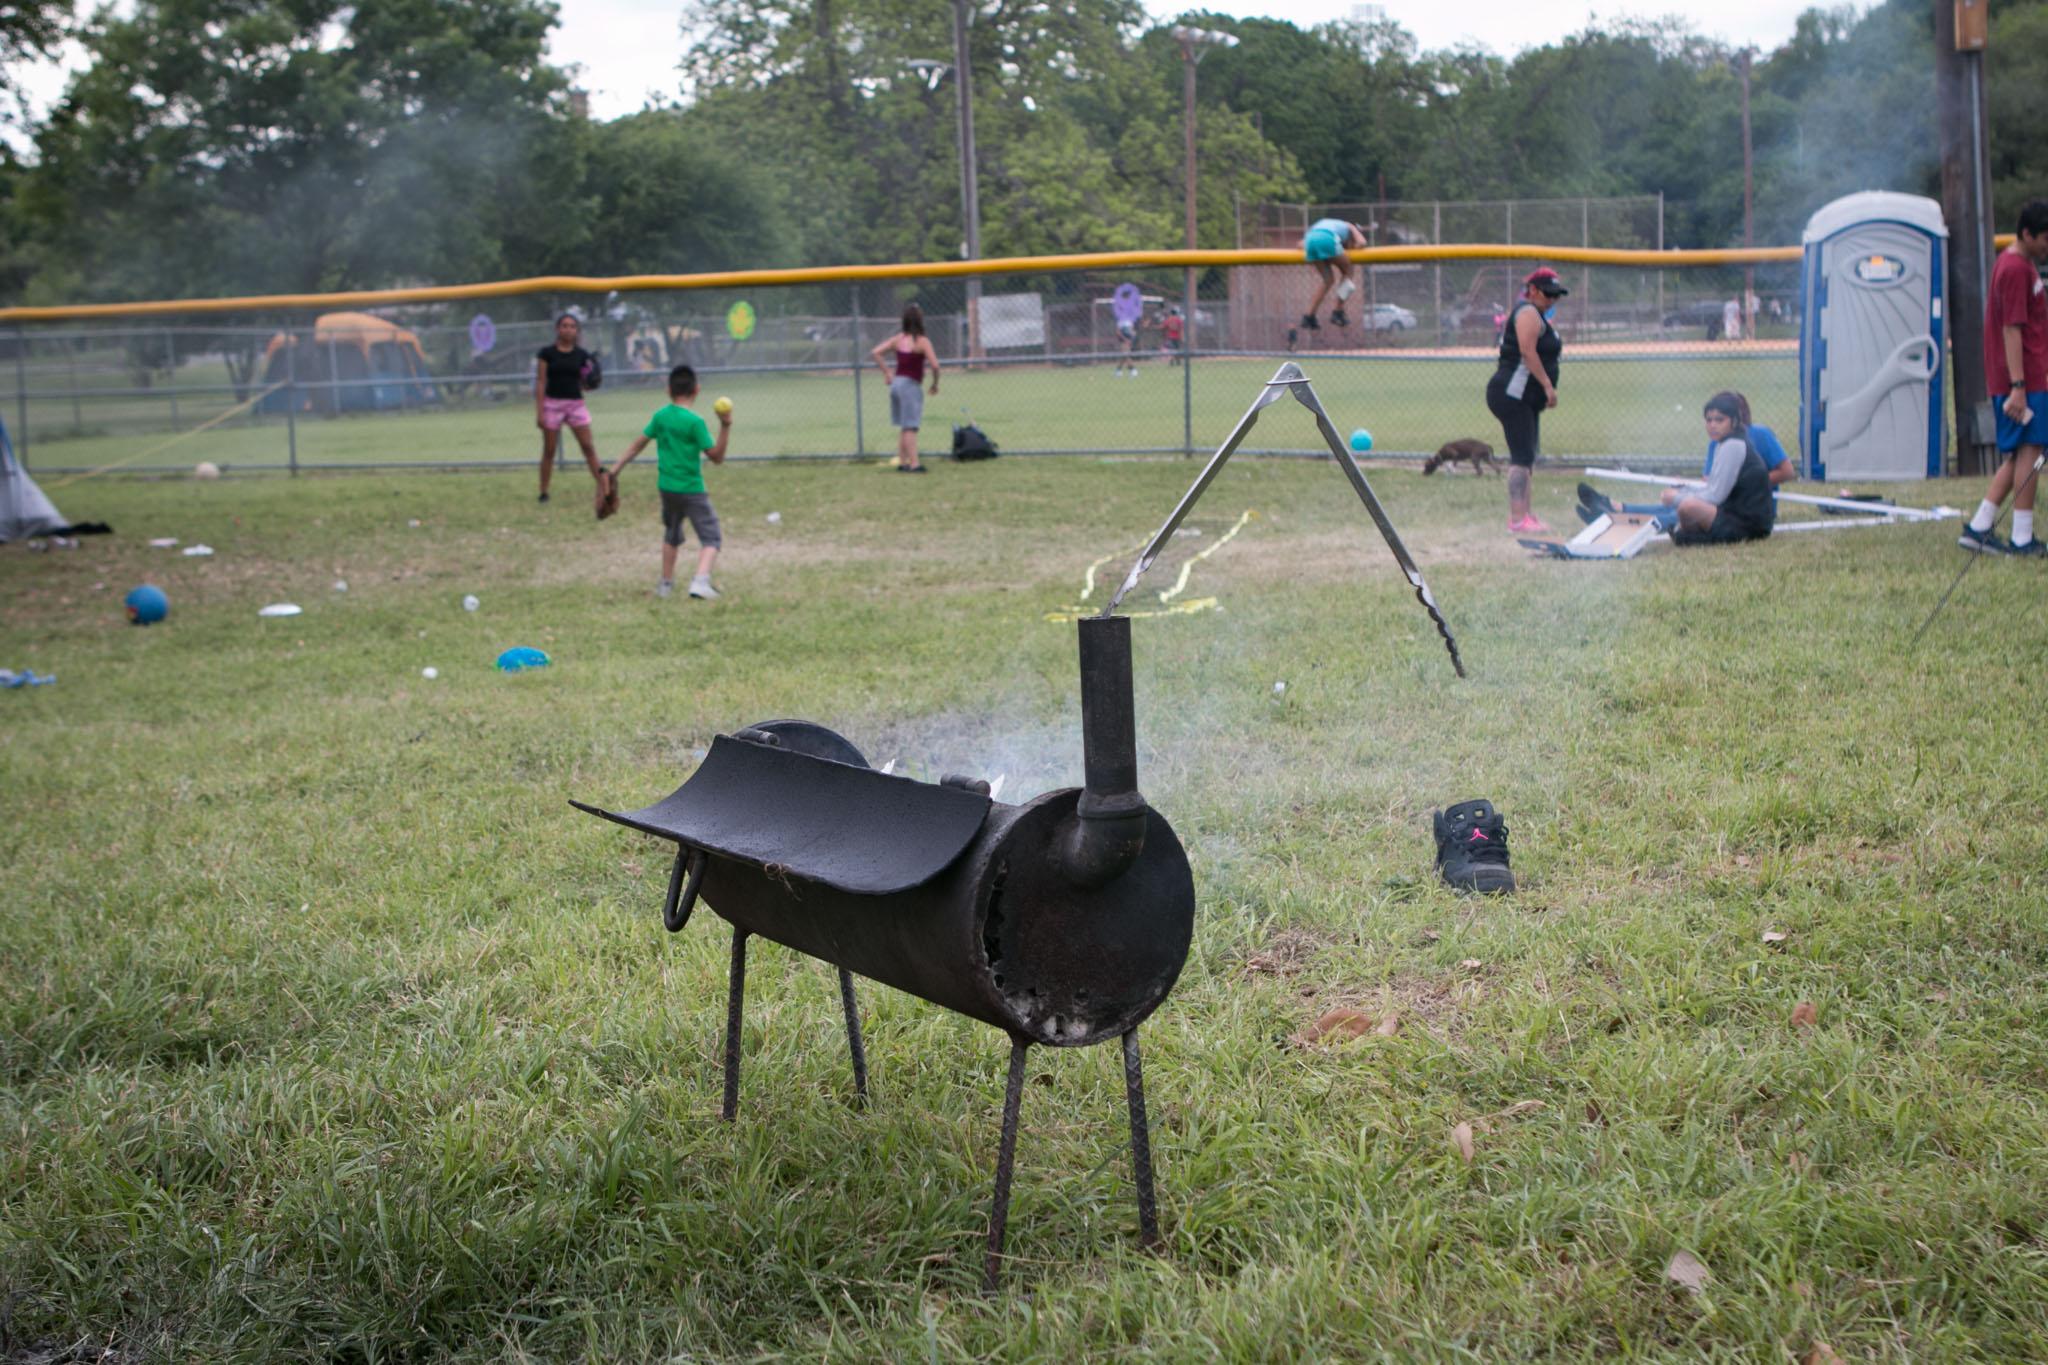 Families cook during Easter weekend at Brackenridge Park.